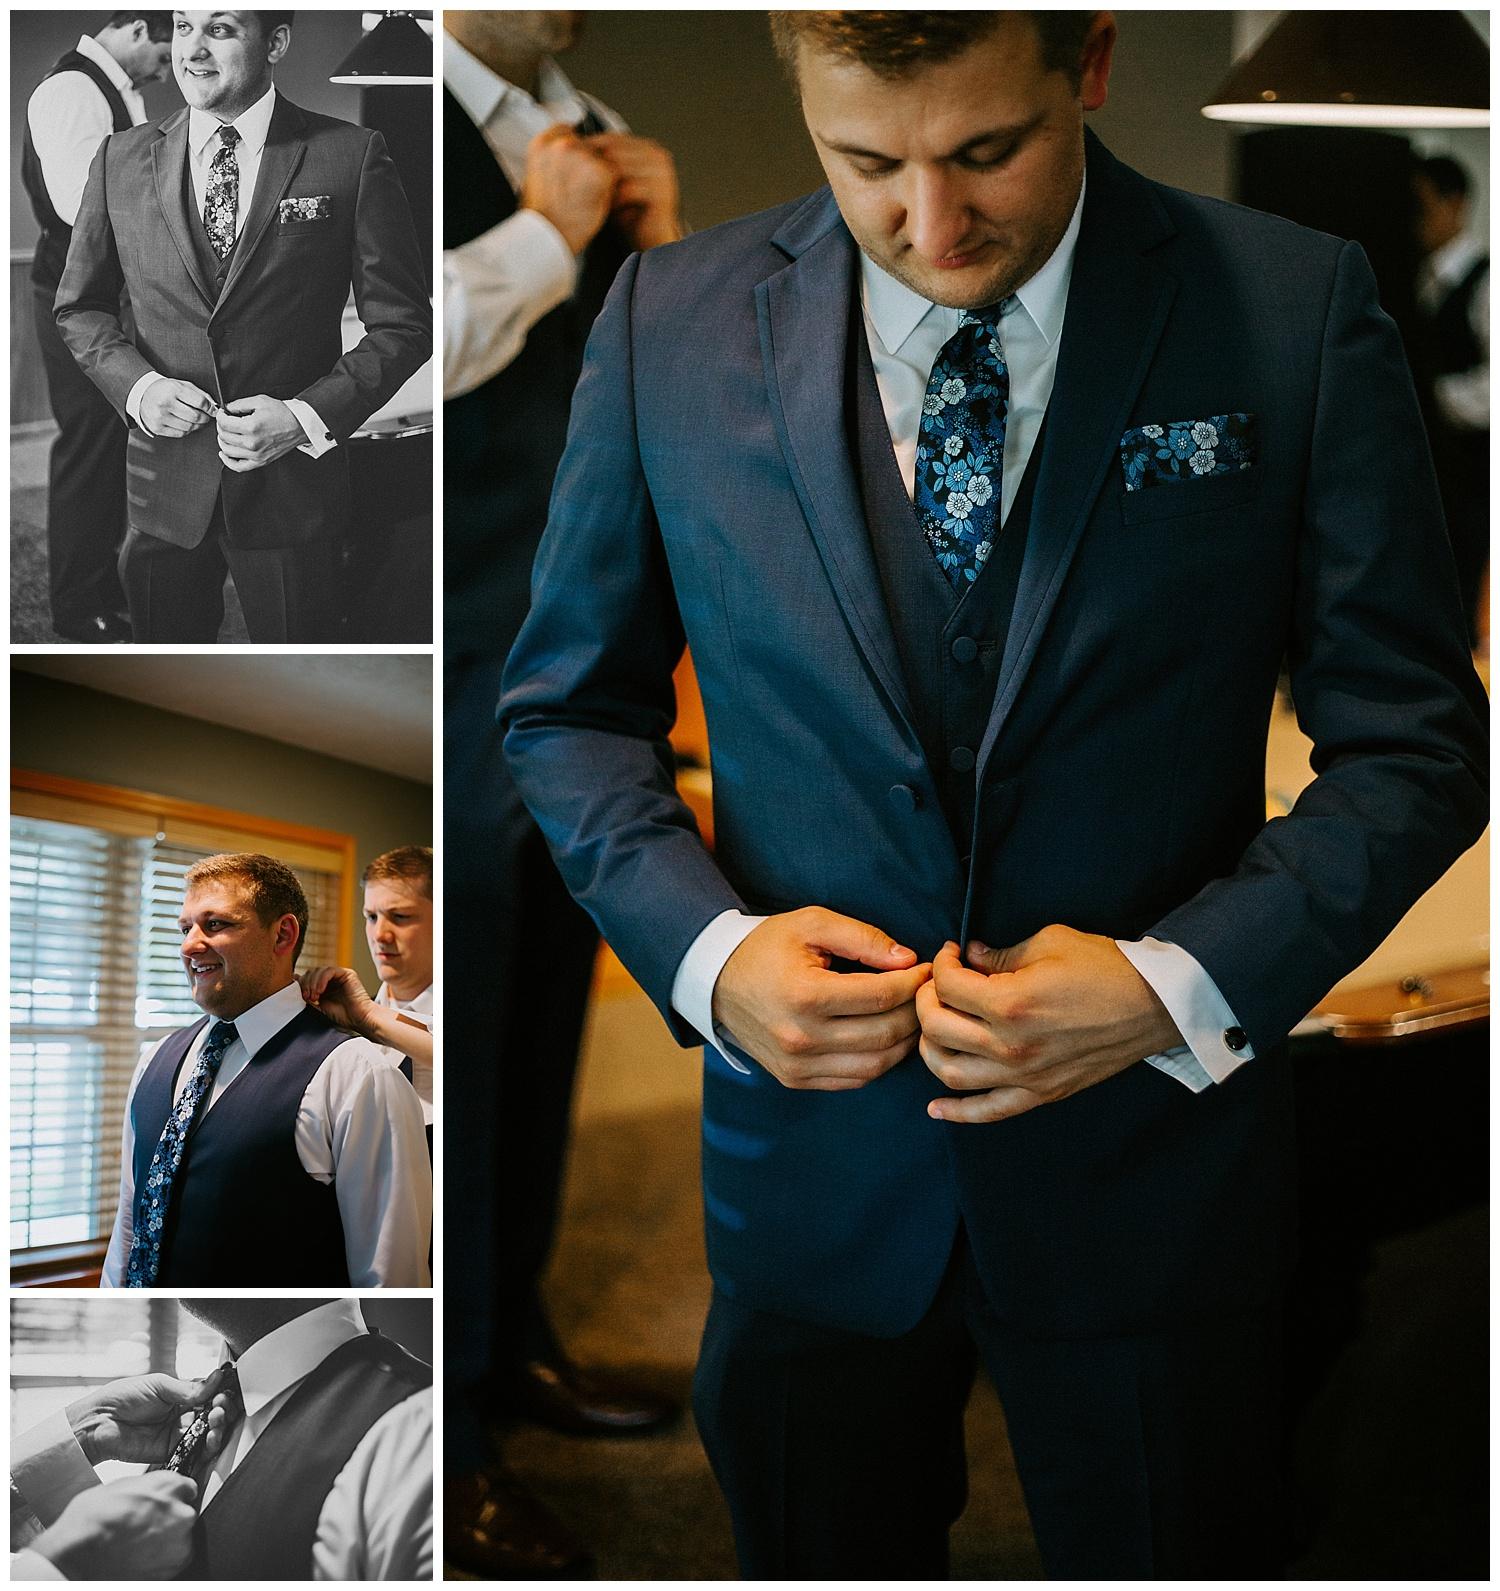 Destination-Wedding-Photographer-in-NEPA-Palmerton-PA_0006.jpg